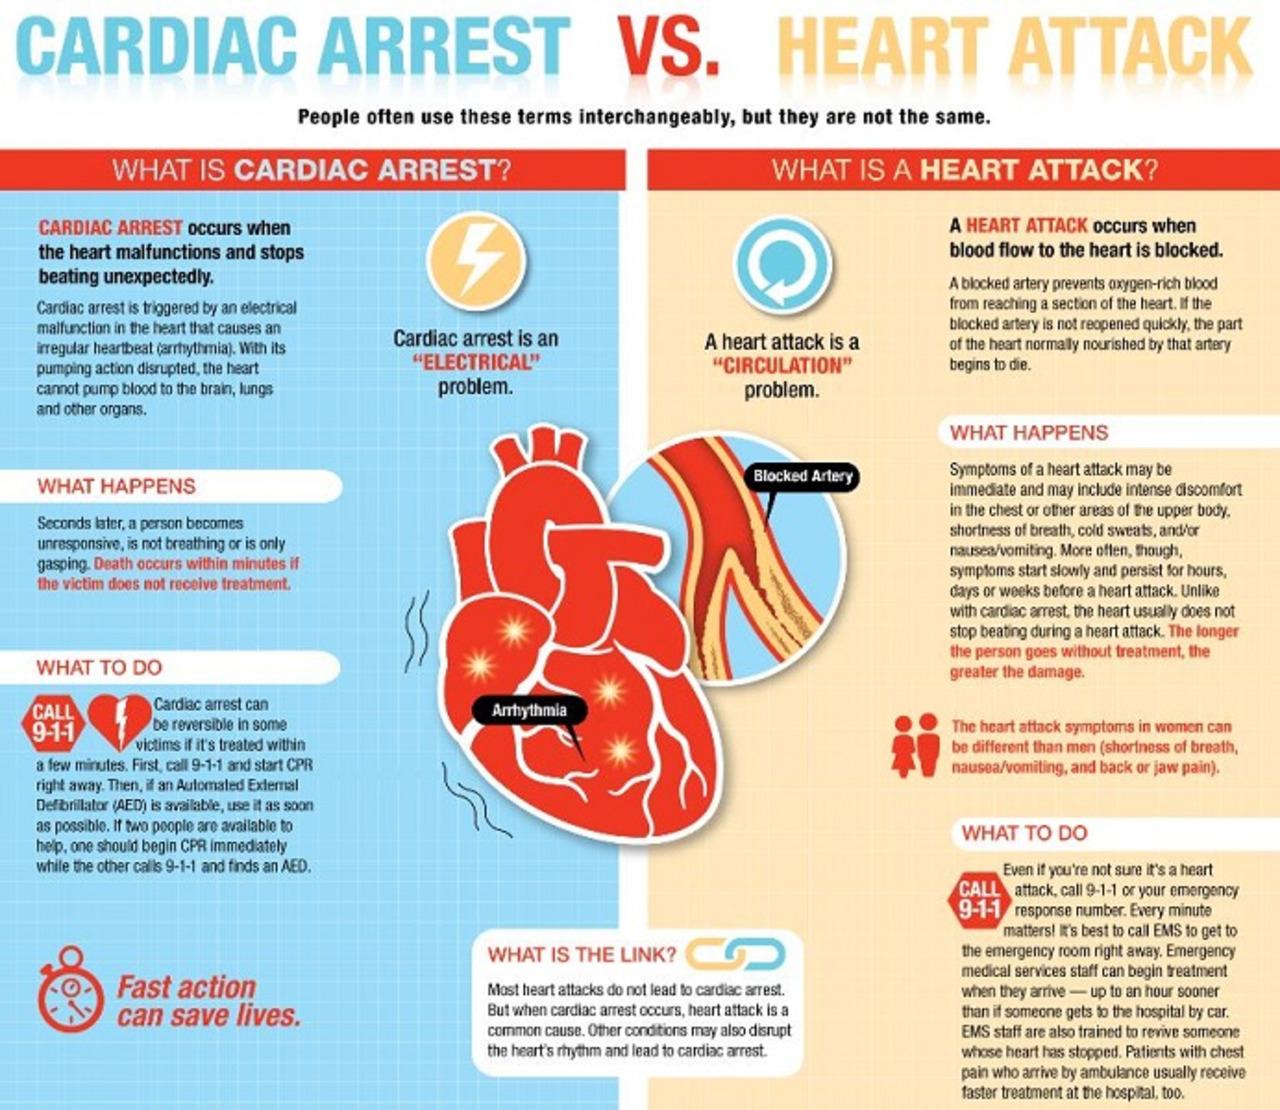 American Heart Association Journal Report Disease Cardiac Arrest